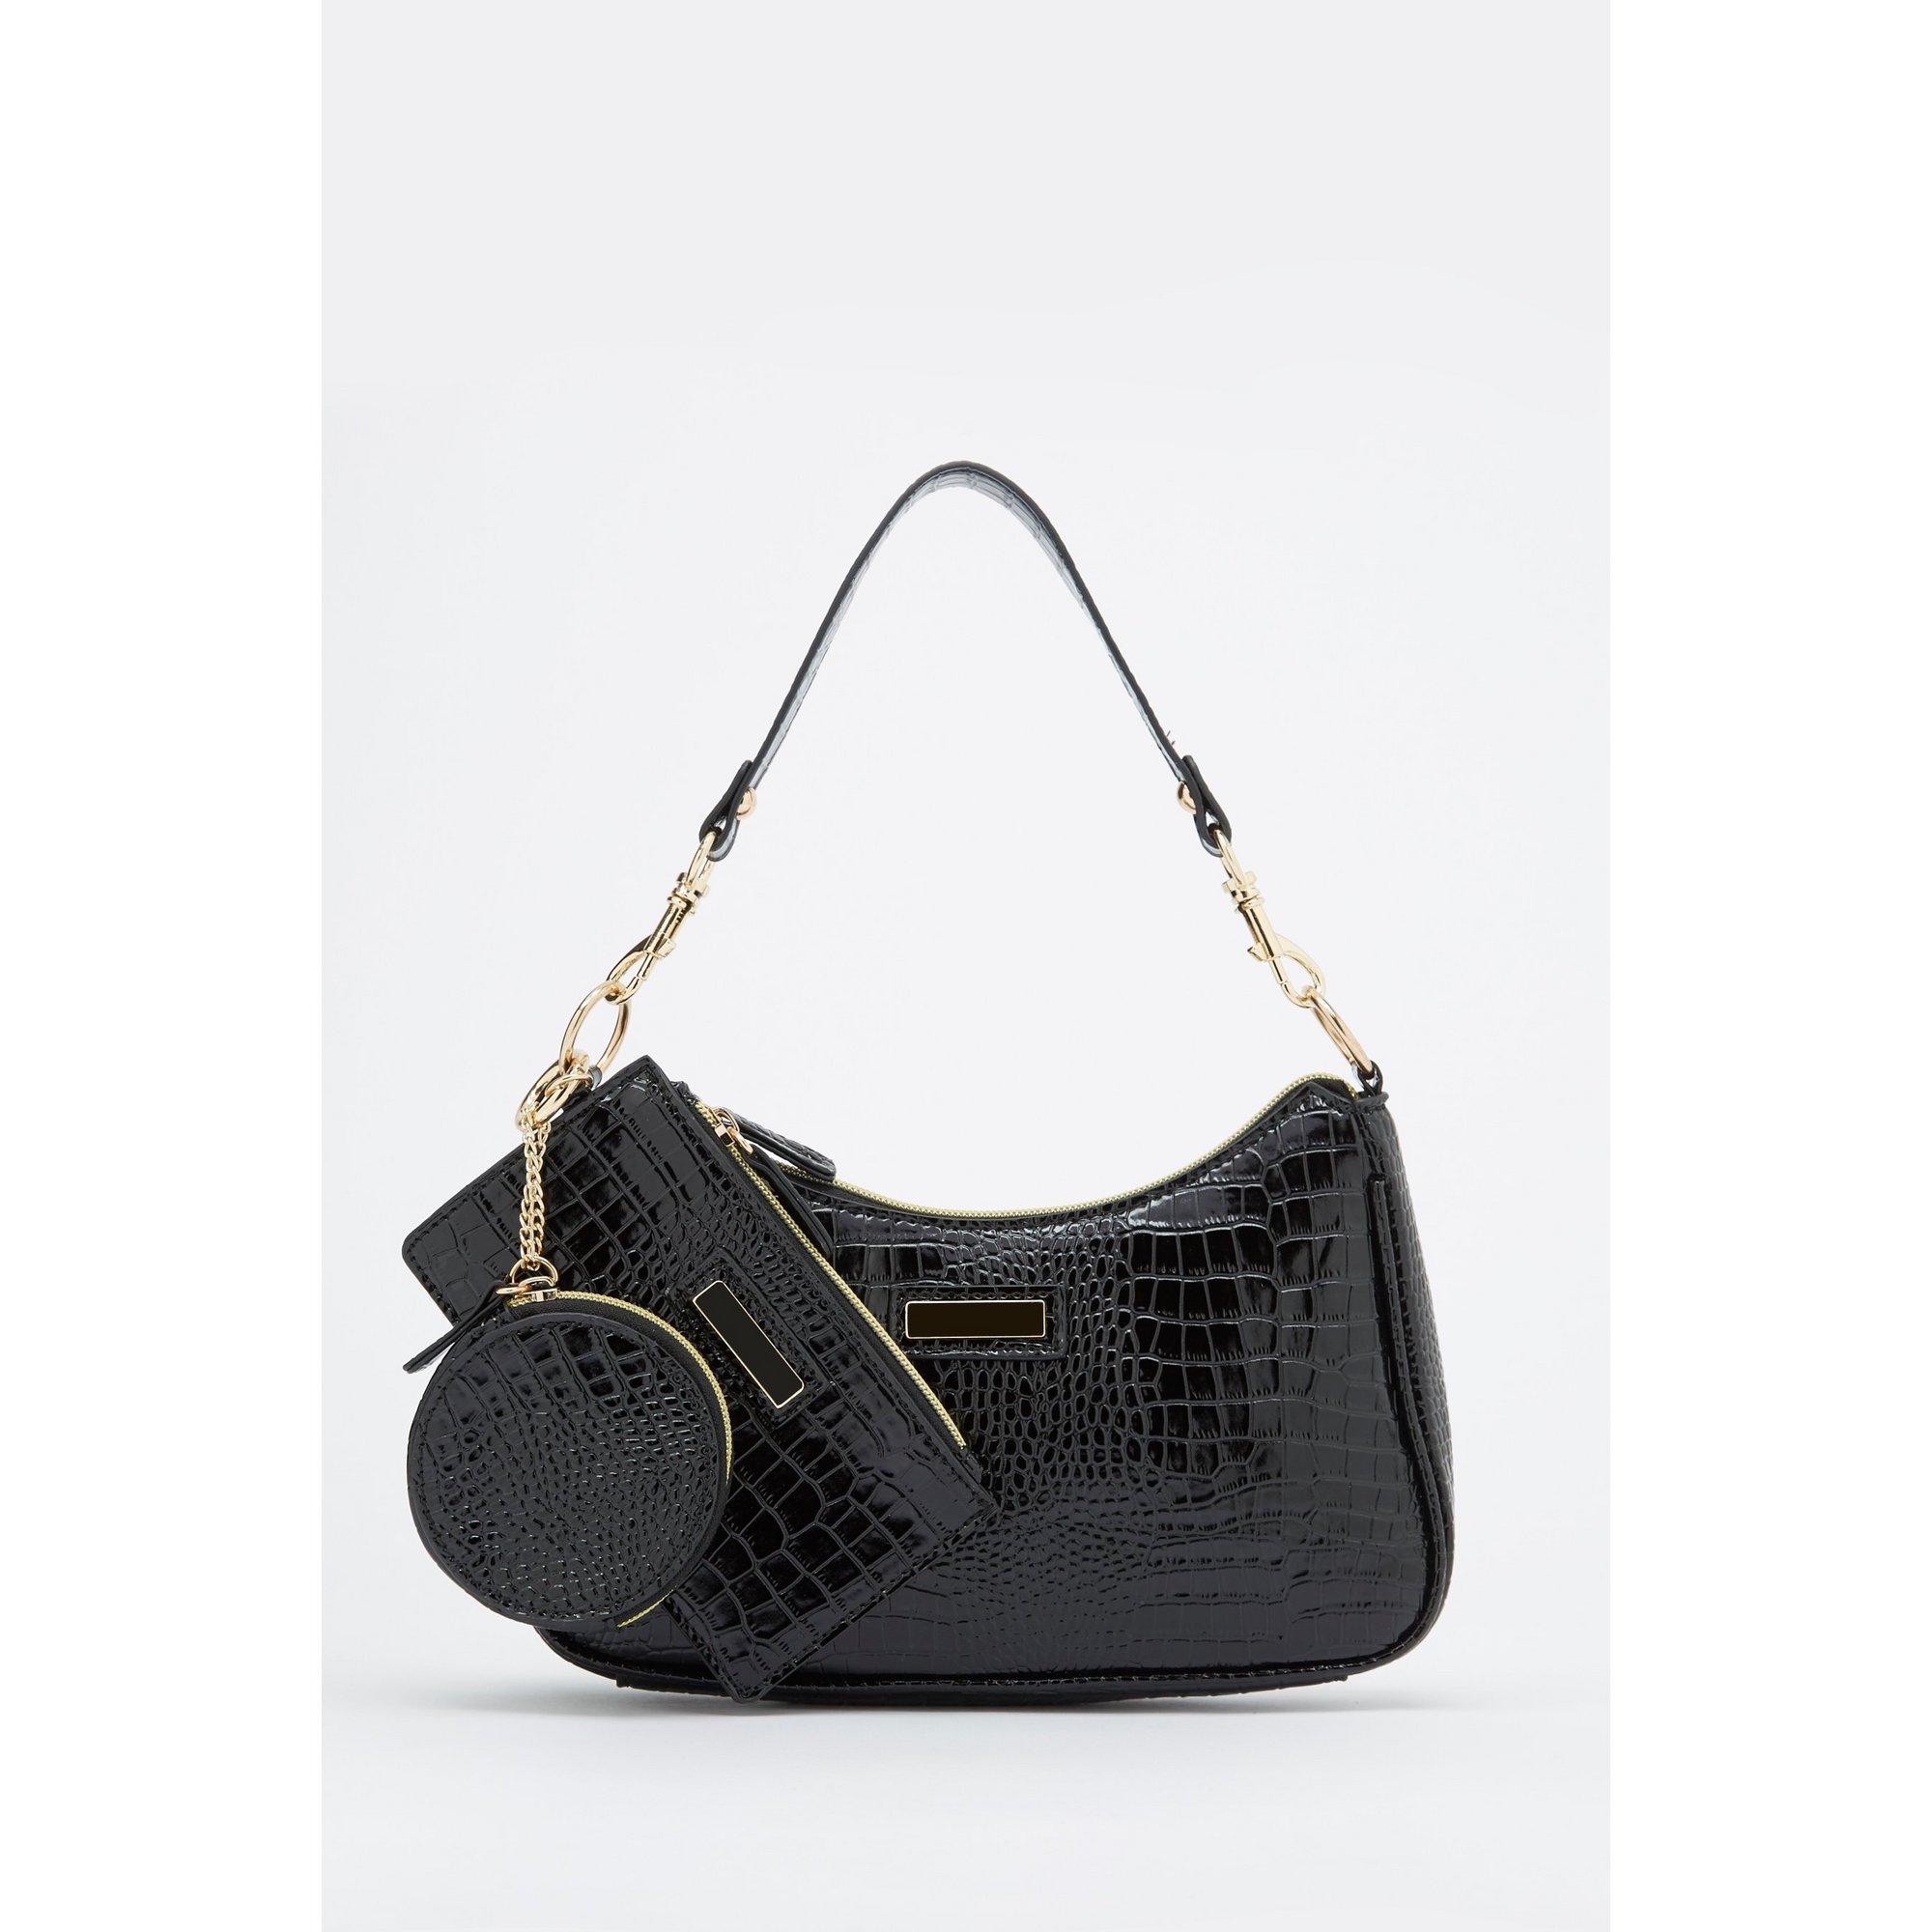 Image of 3-Piece Black Shoulder Bag&#44 Large Purse and Coin Purse Set